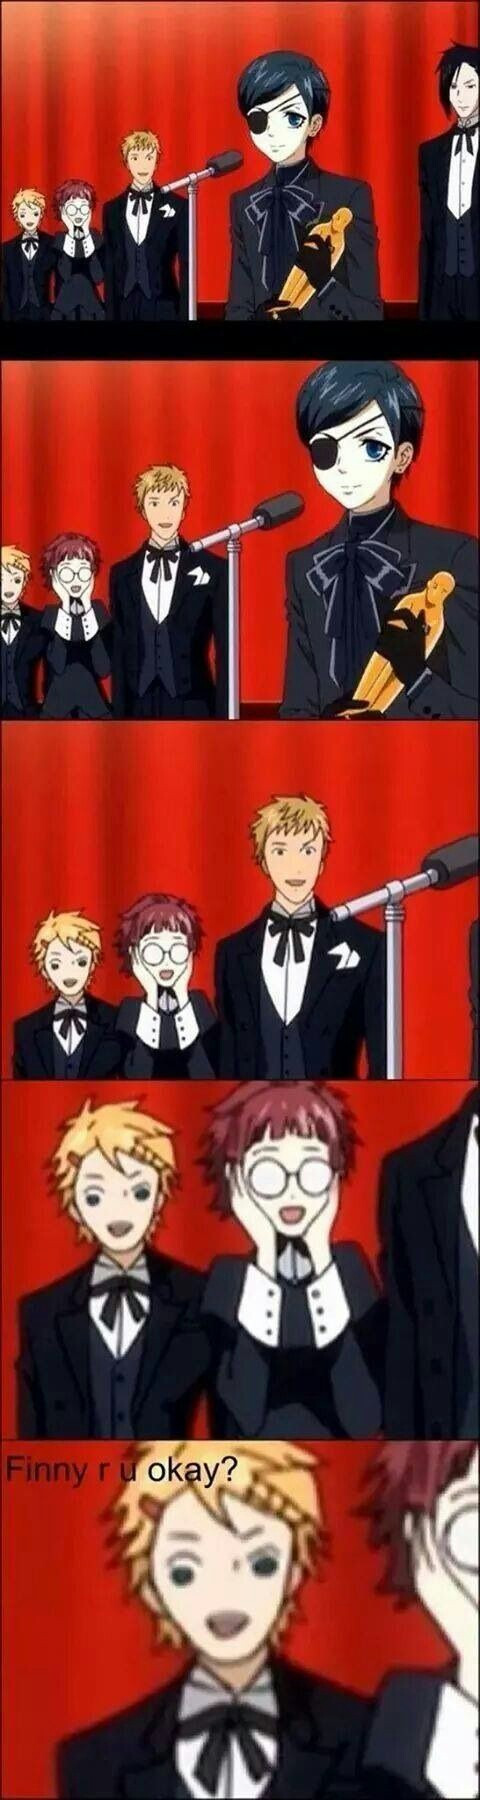 #Funny #BlackButler #Finny #Finnian #Meyrin #Bart #Sebastian #Michaelis #Ciel #Phantomhive #Anime #Kuroshitsuji